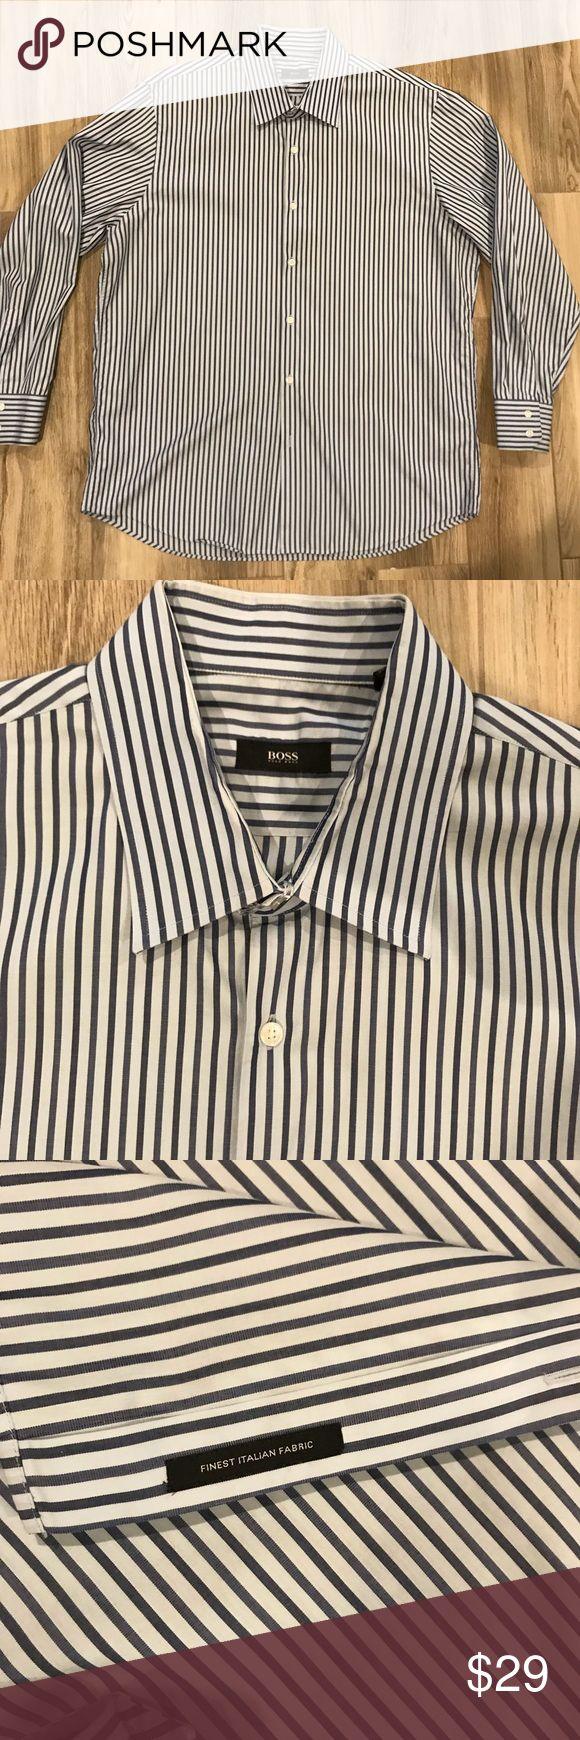 Hugo Boss Men's Button Down Hugo Boss Men's Button Down Shirt. Light blue with navy stripes. Neck 18 Sleeve 34/35. Like new condition-no defects. Hugo Boss Shirts Casual Button Down Shirts